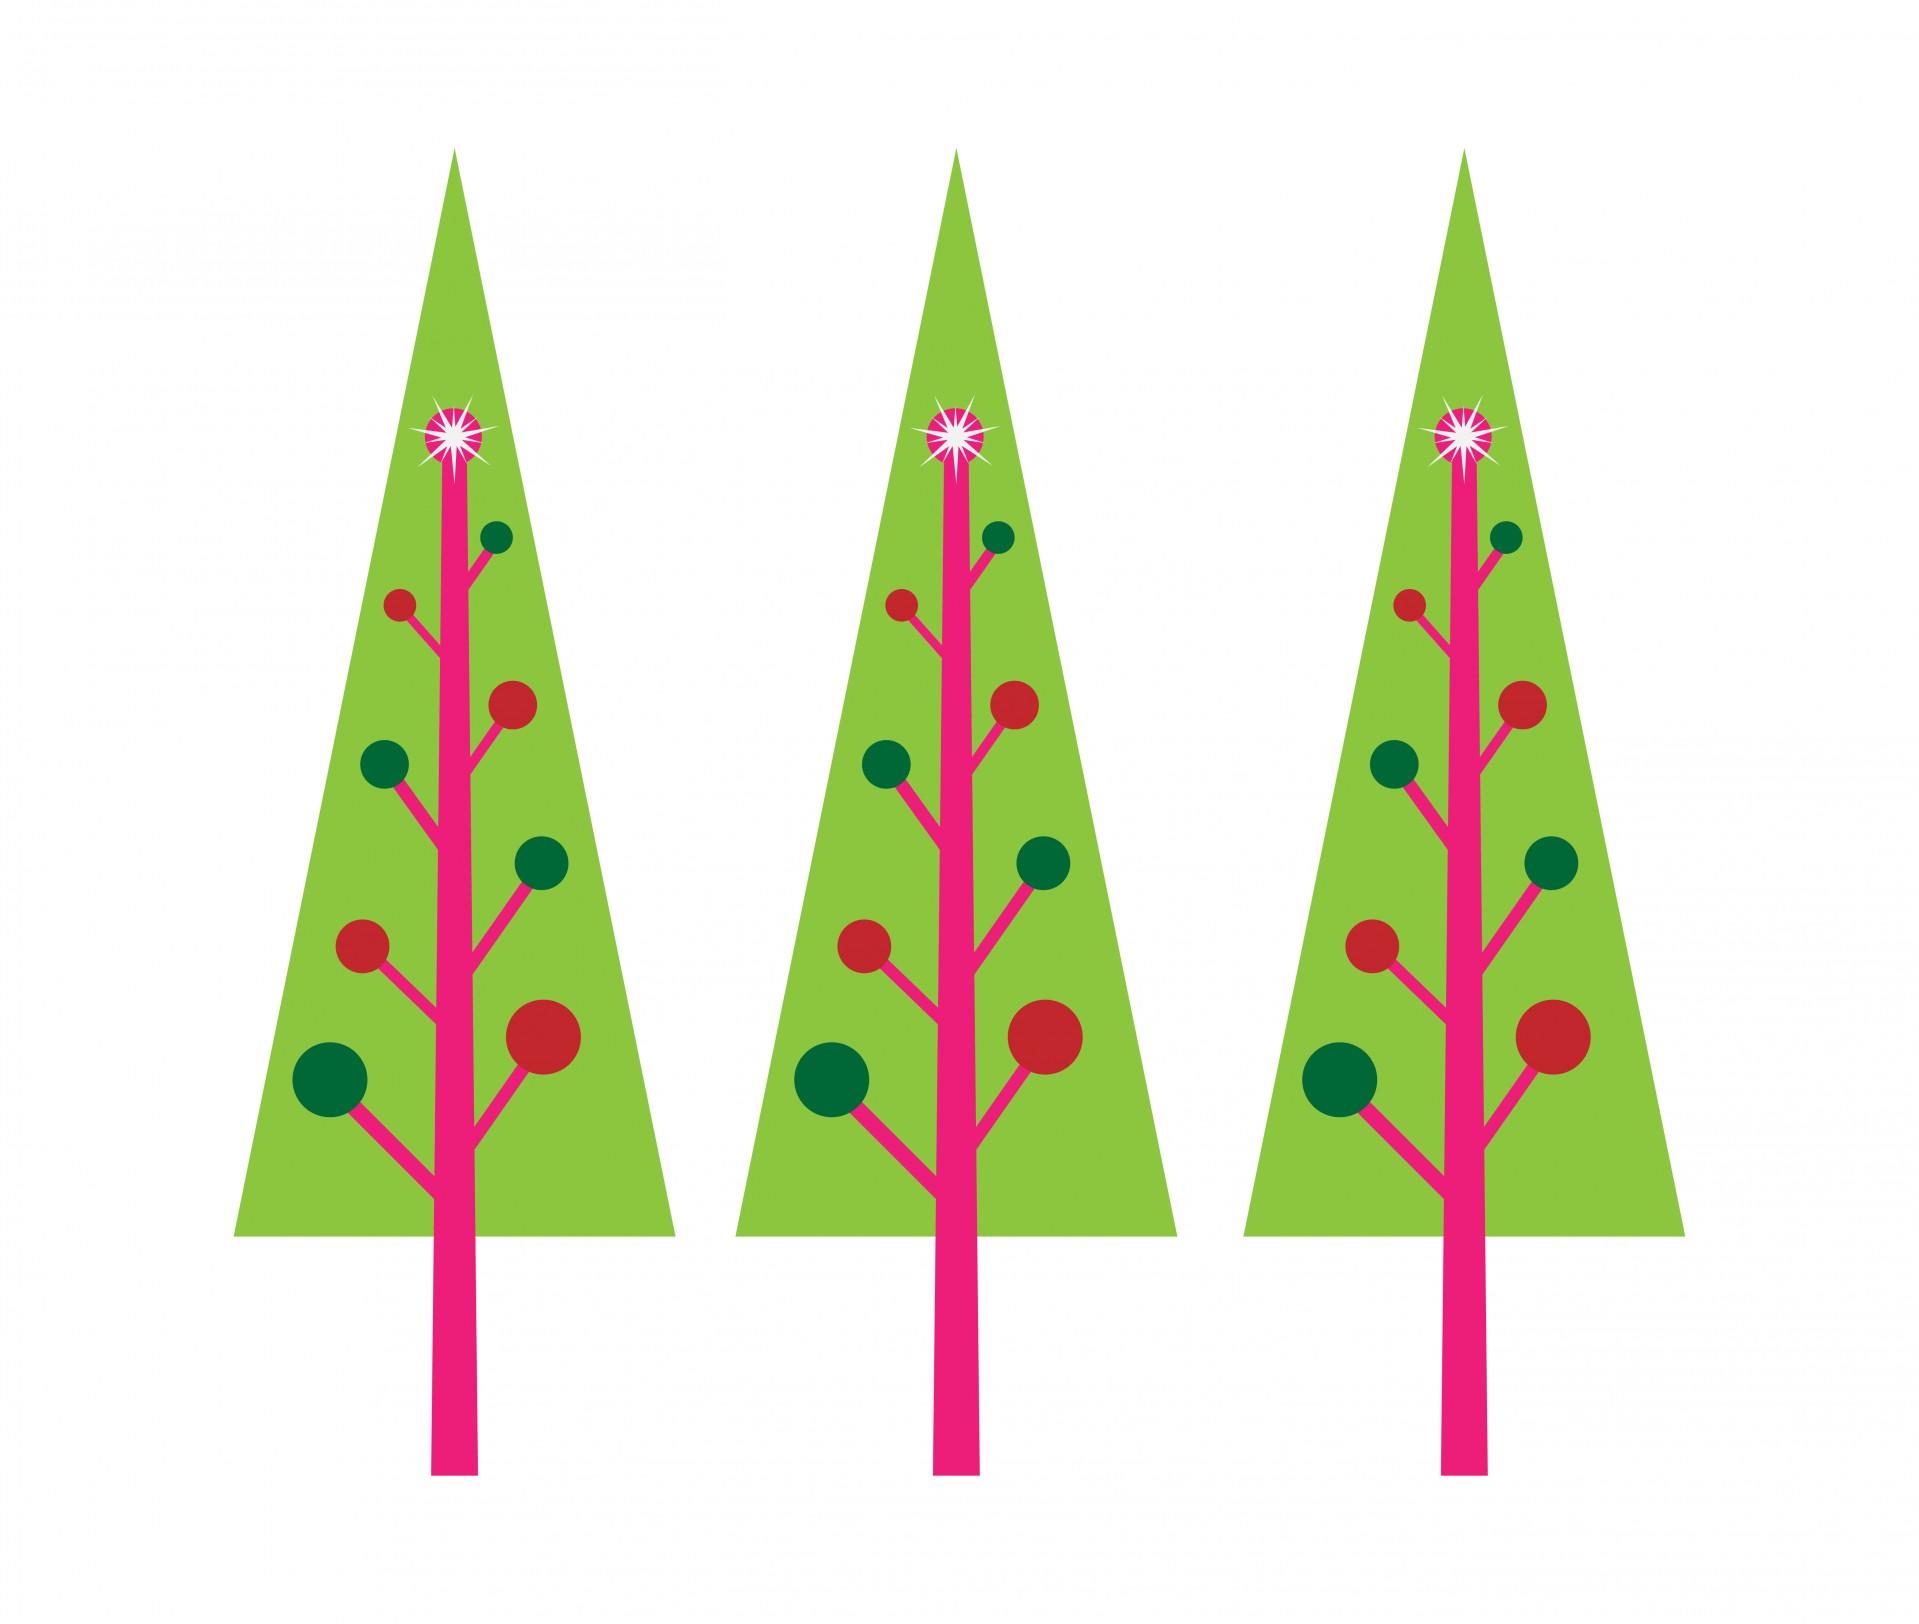 1919x1624 Christmas Trees Clipart Free Stock Photo